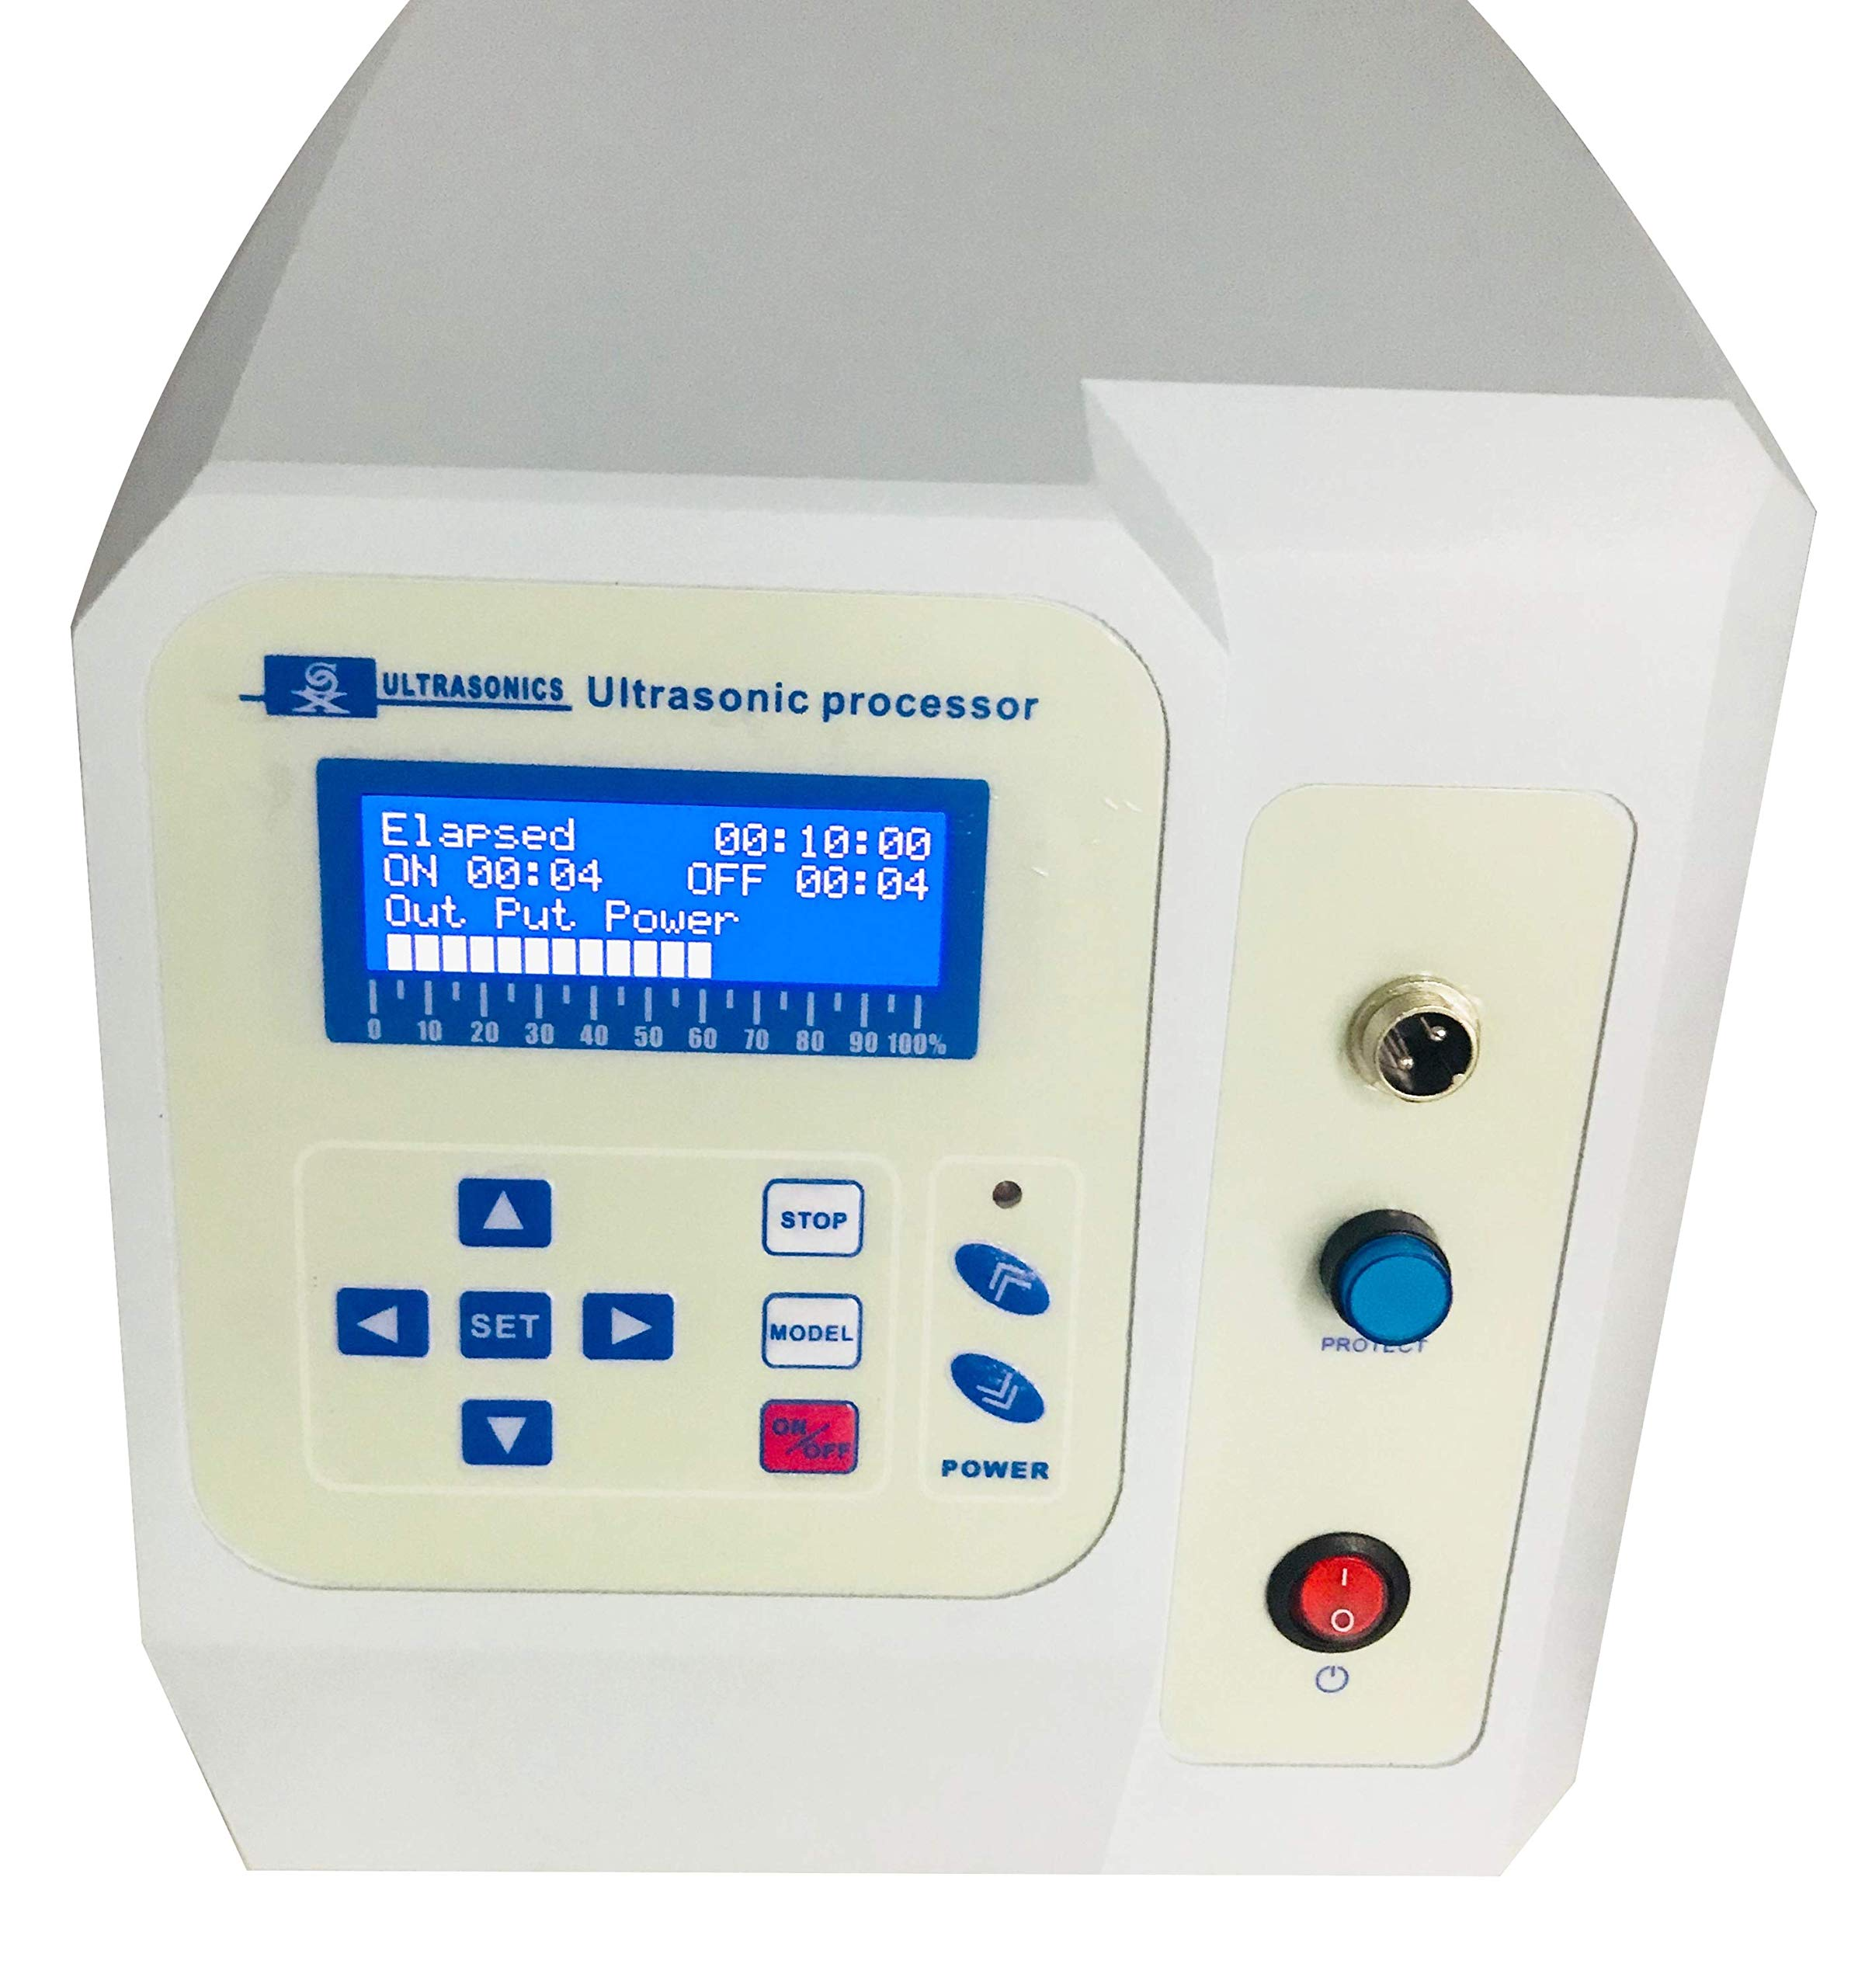 Ultrasonic Homogenizer 1800W Lab Sonicator Processor Ultrasonic Cell Disruptor Handling Capacity 100ml—3000ml by BAOSHISHAN (Image #3)